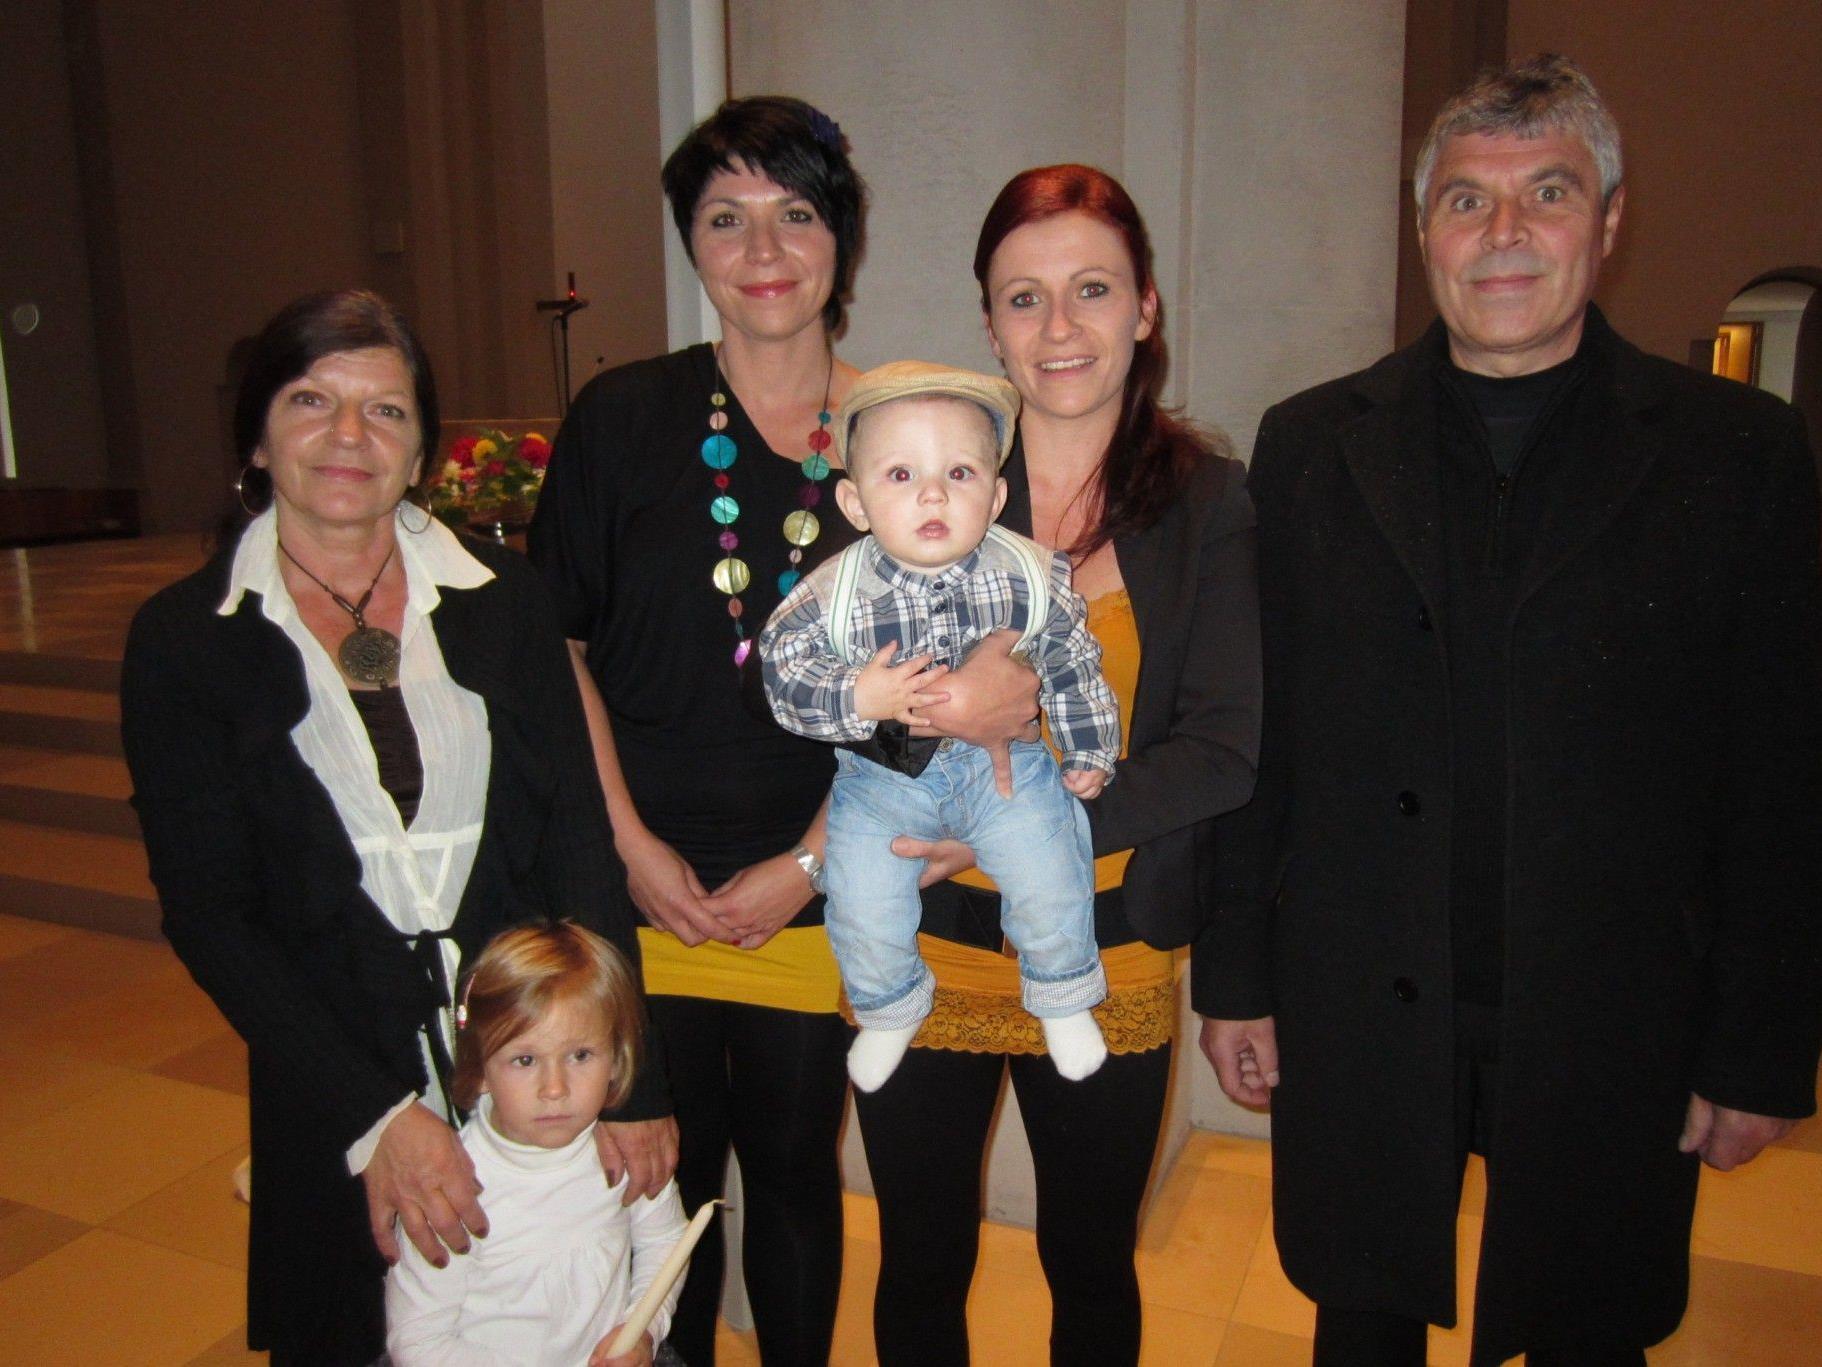 Niclas Zizer wurde getauft.